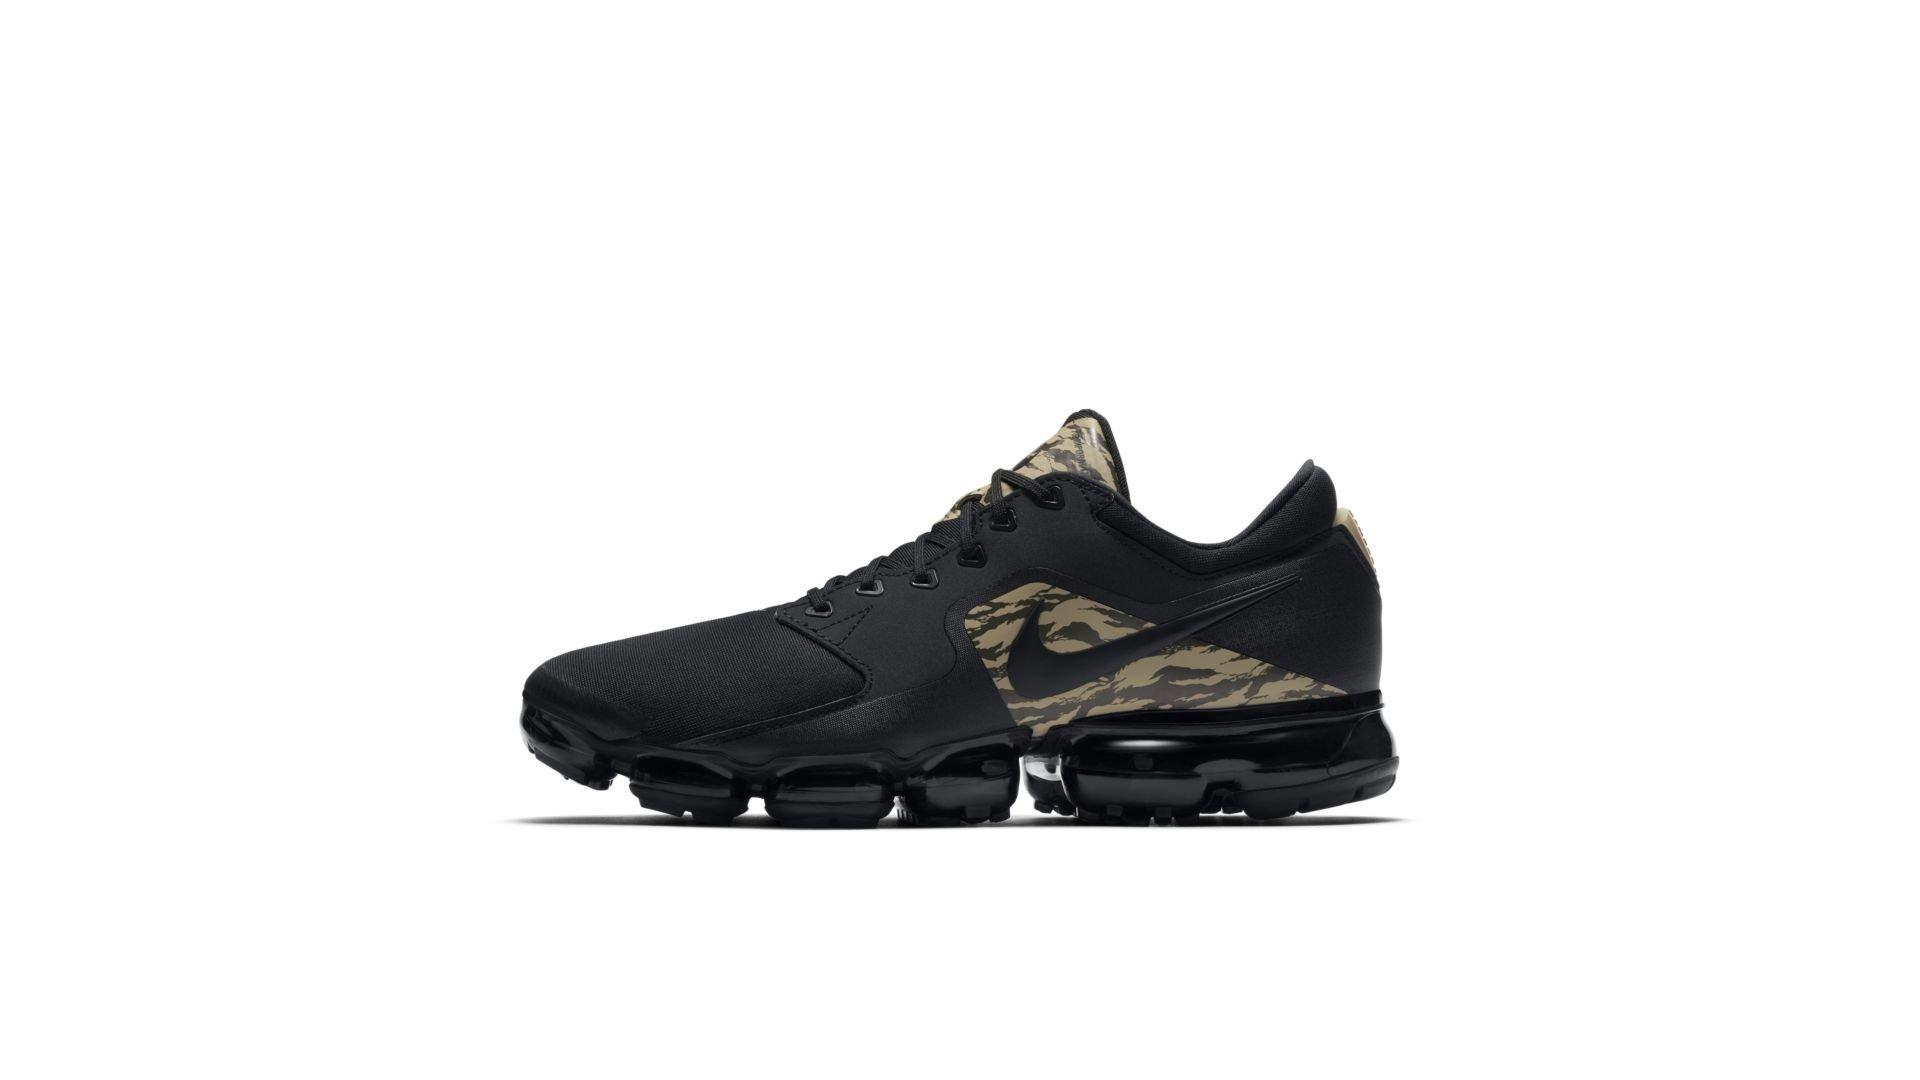 Nike Air VaporMax CS Black Camo (AQ8627-001)